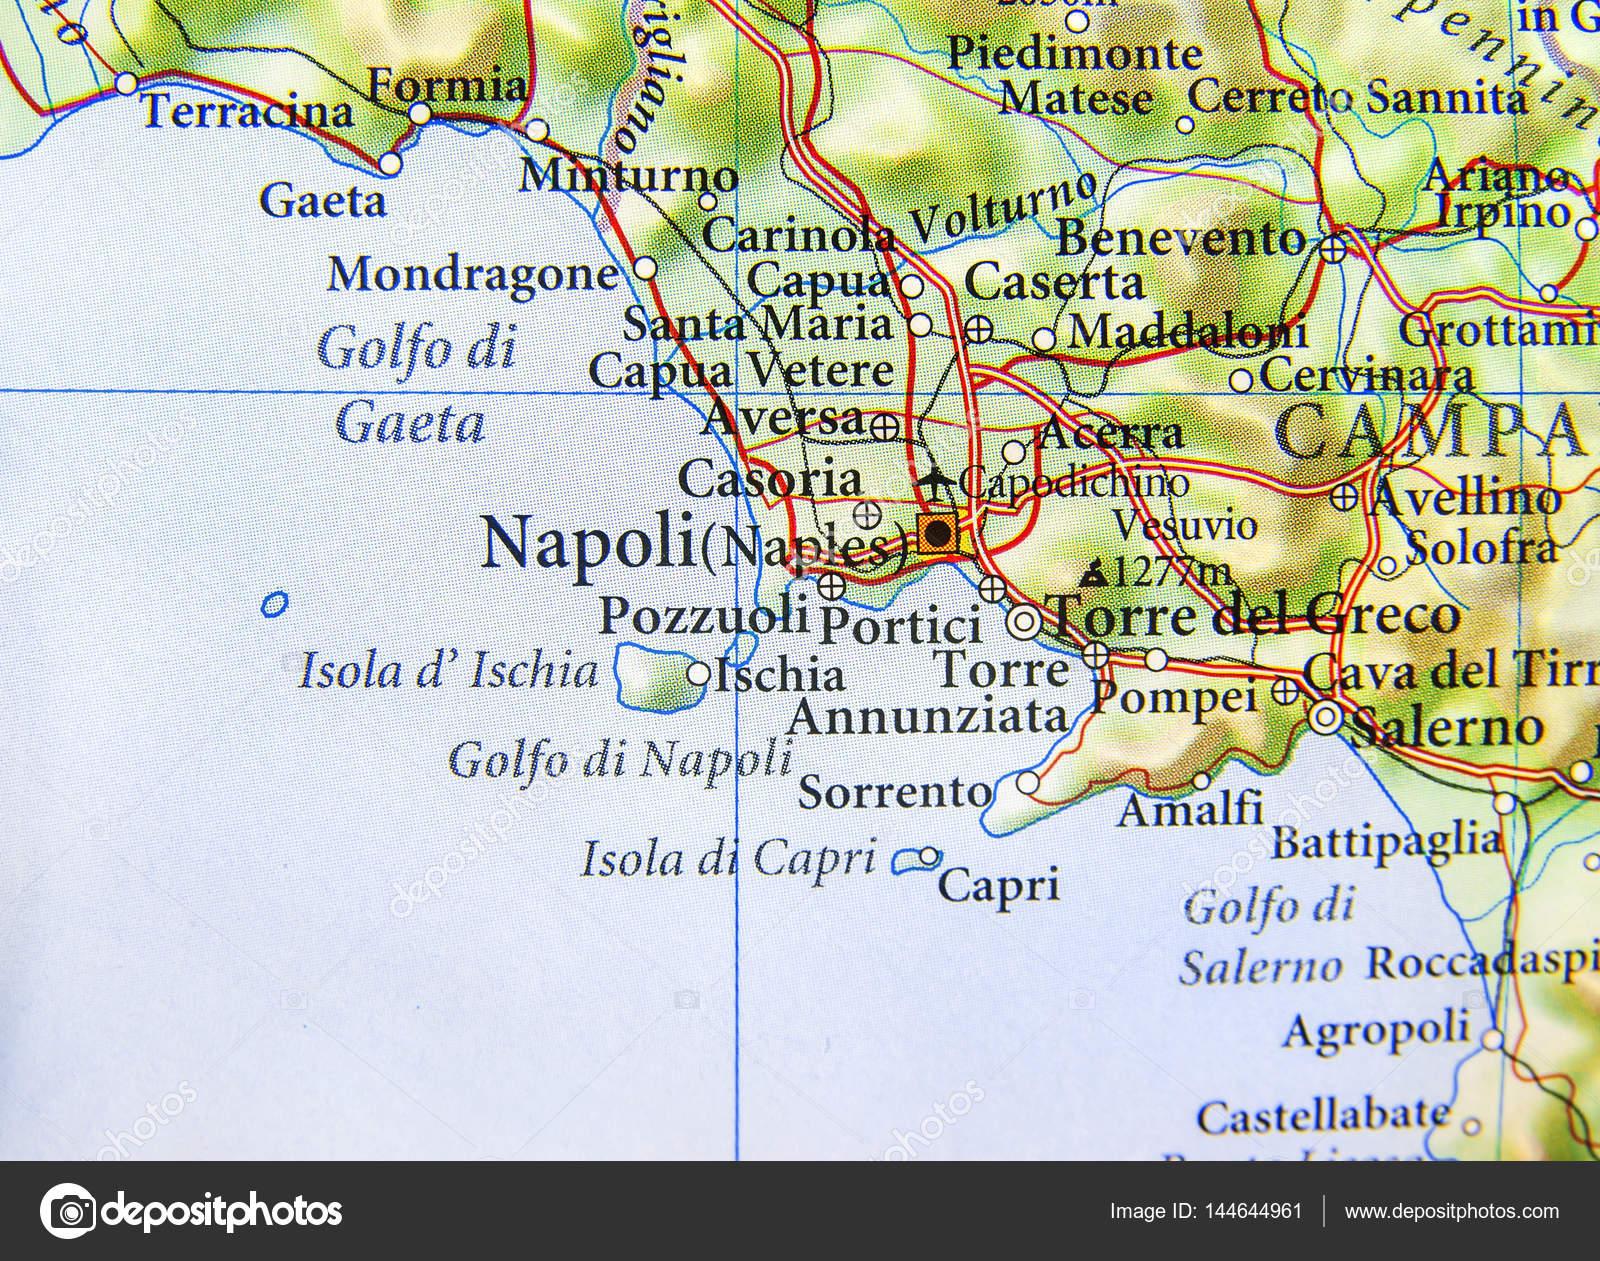 italien karta napoli Geografiska karta över europeiska land Italien med Napoli city  italien karta napoli